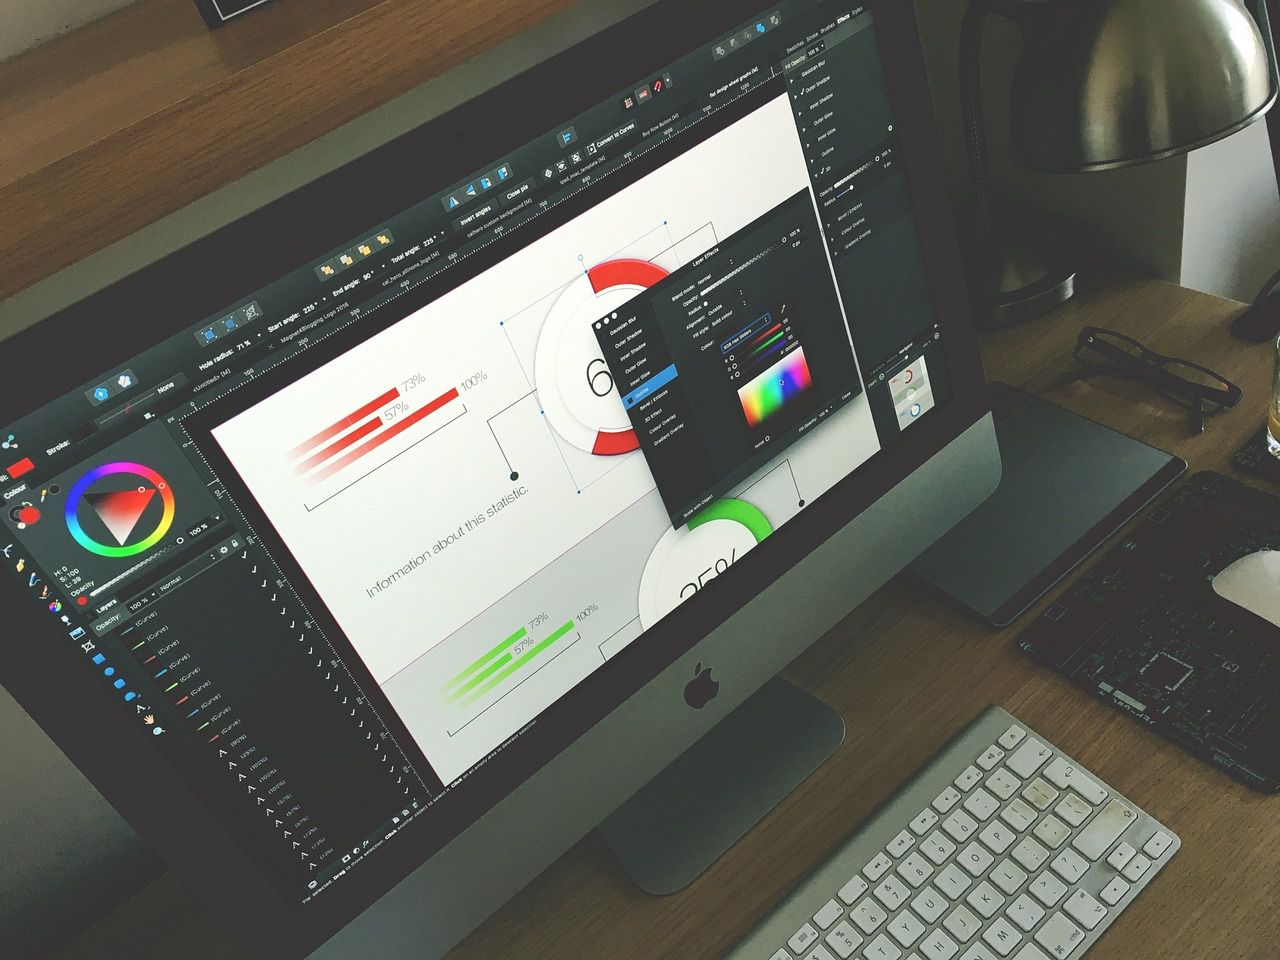 Graphic design software on a desktop computer